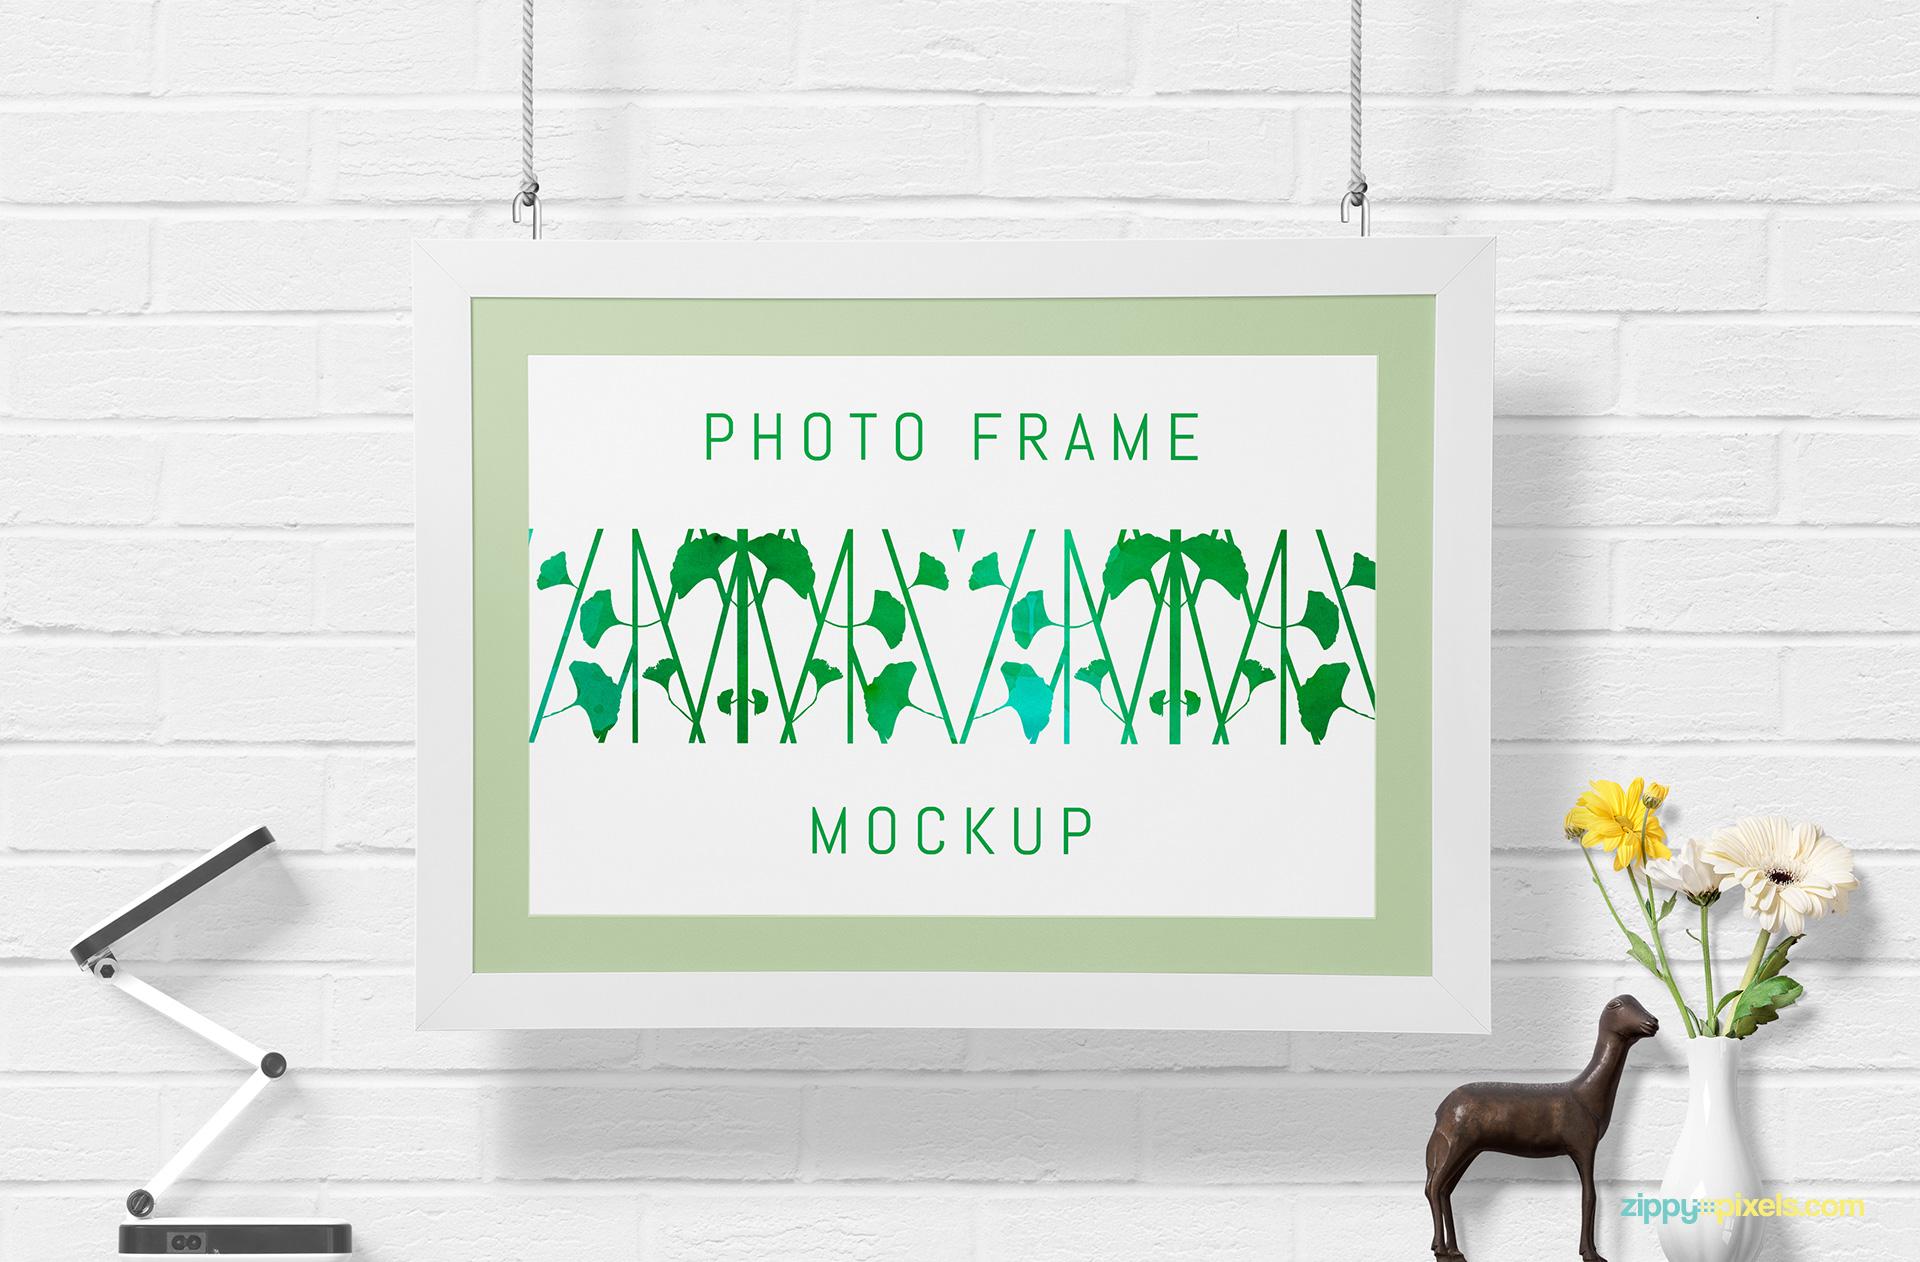 Free wall frame mockup.